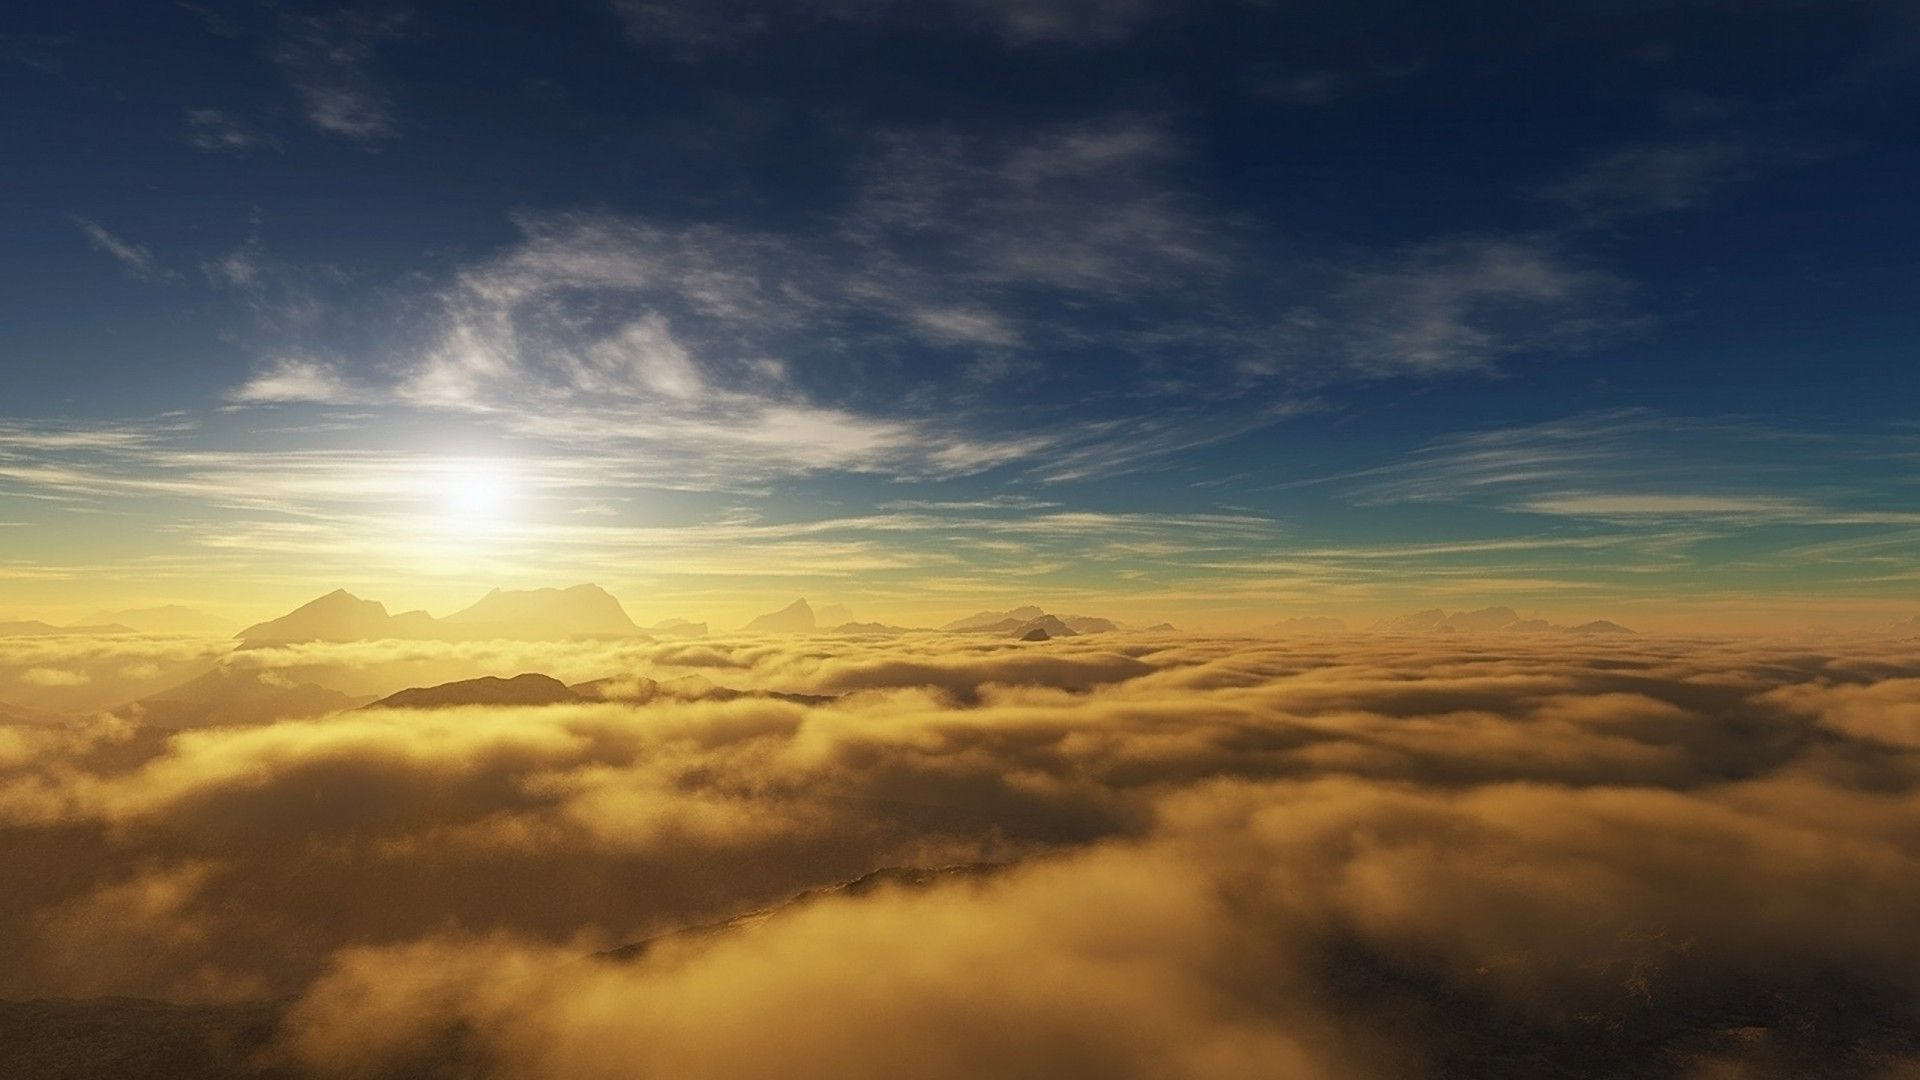 Cloud Background Images HD Wallpaper Imágenes de fondo